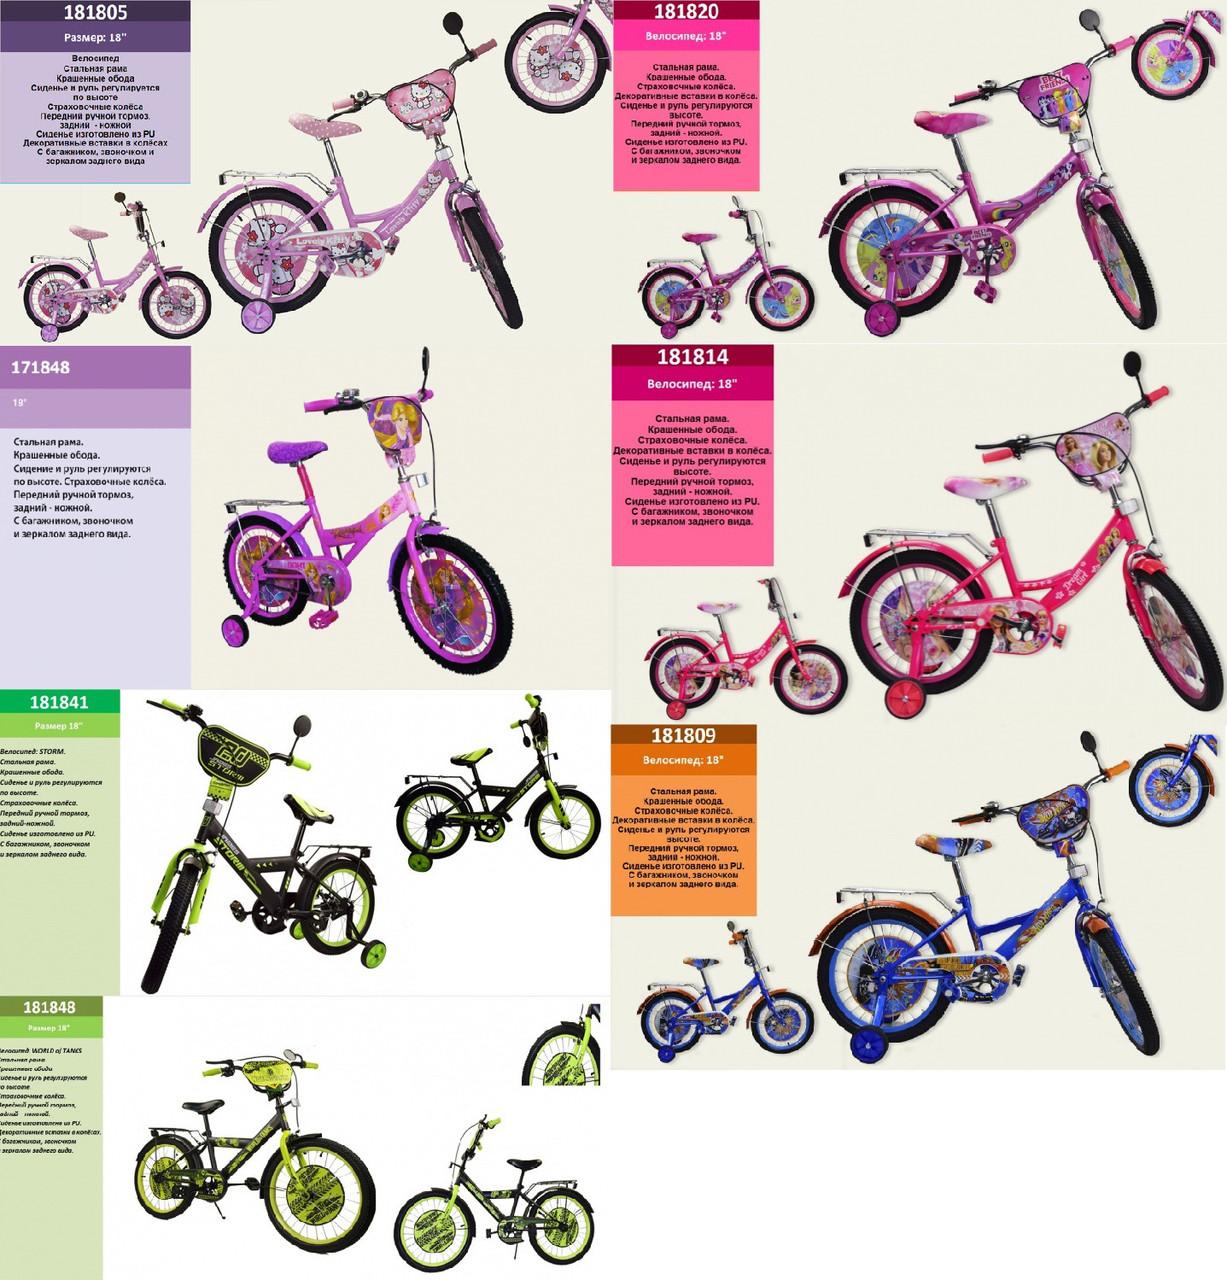 Детский велосипед Пони, Тачки, Хелов Китти, Хот Вилс18 дюймов